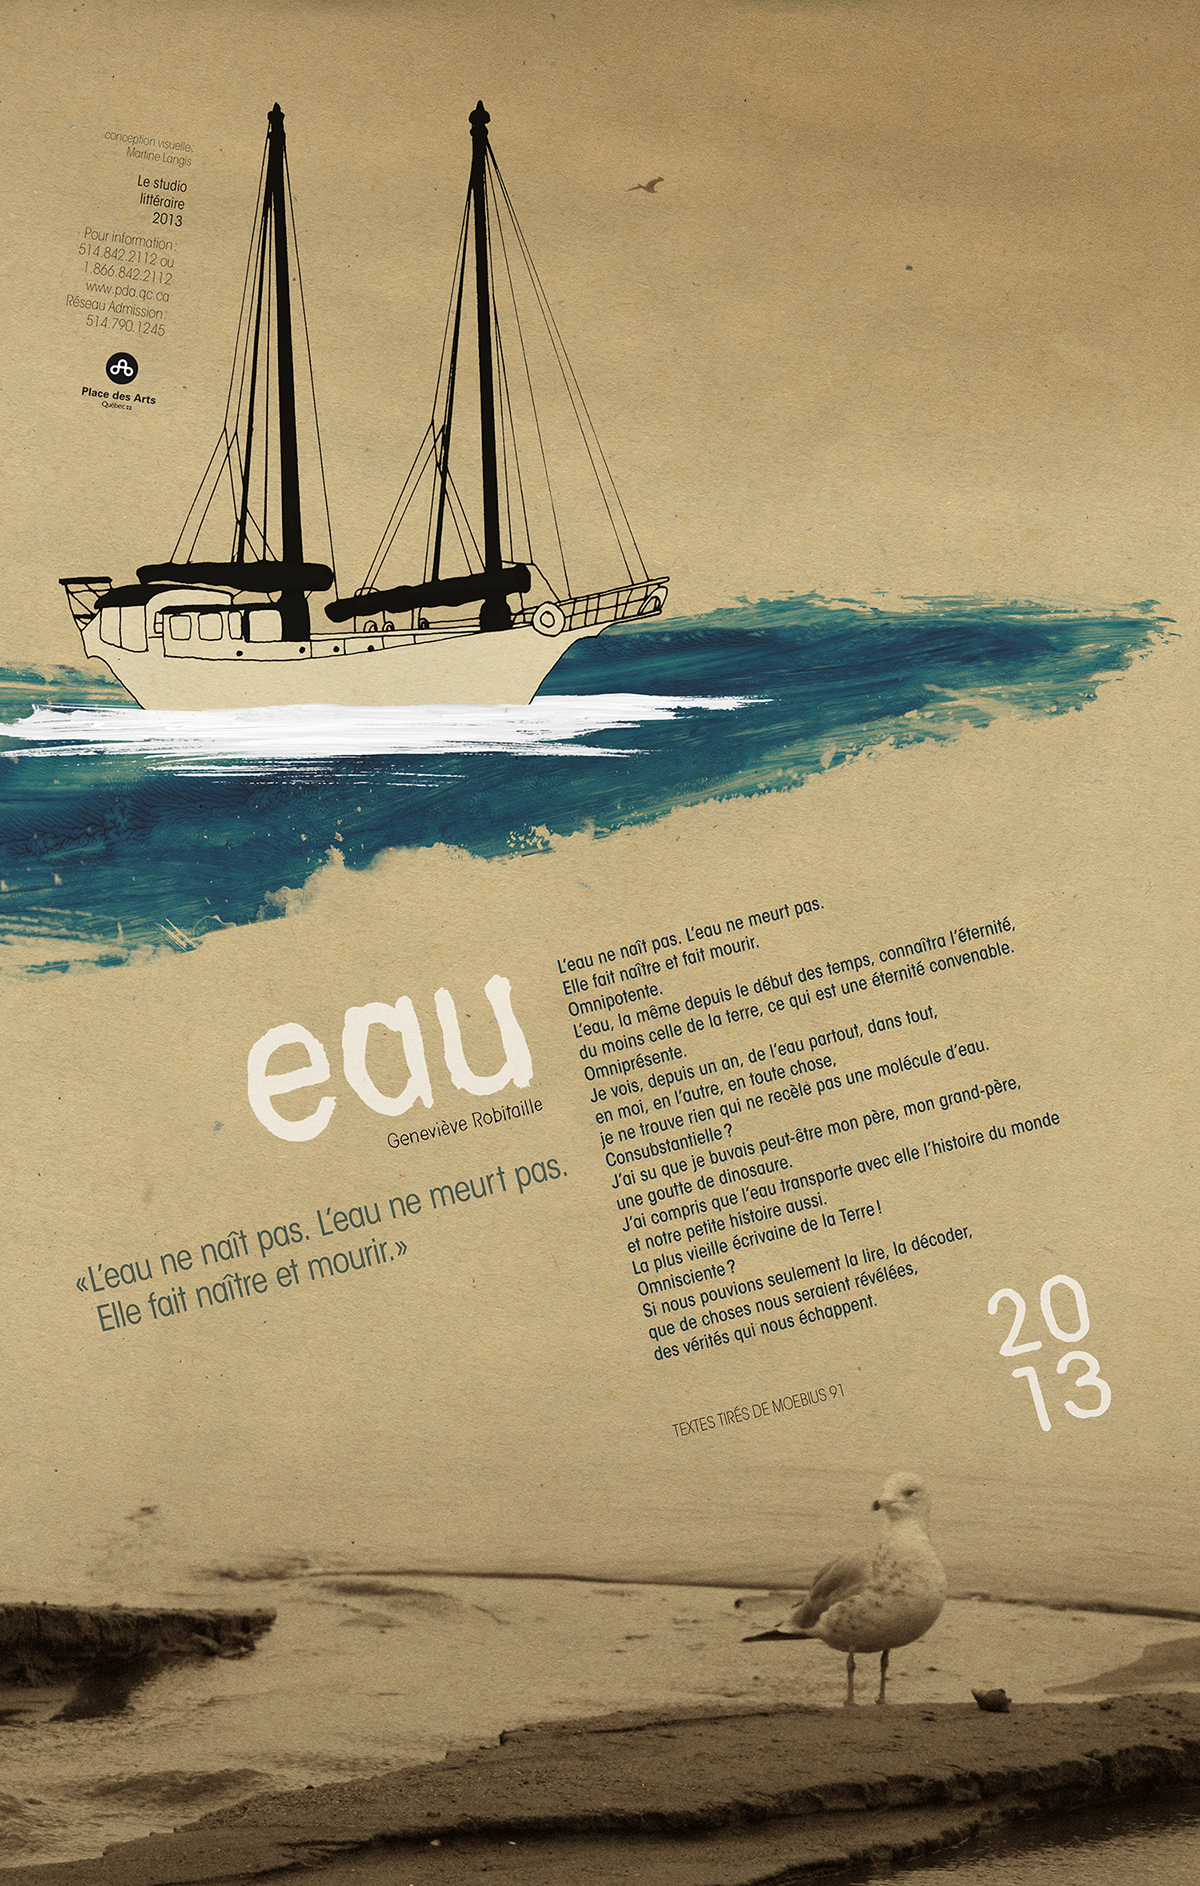 calendar poem water sea legs 35 mm calendrier wajdi poésie photos voilier boat mouette